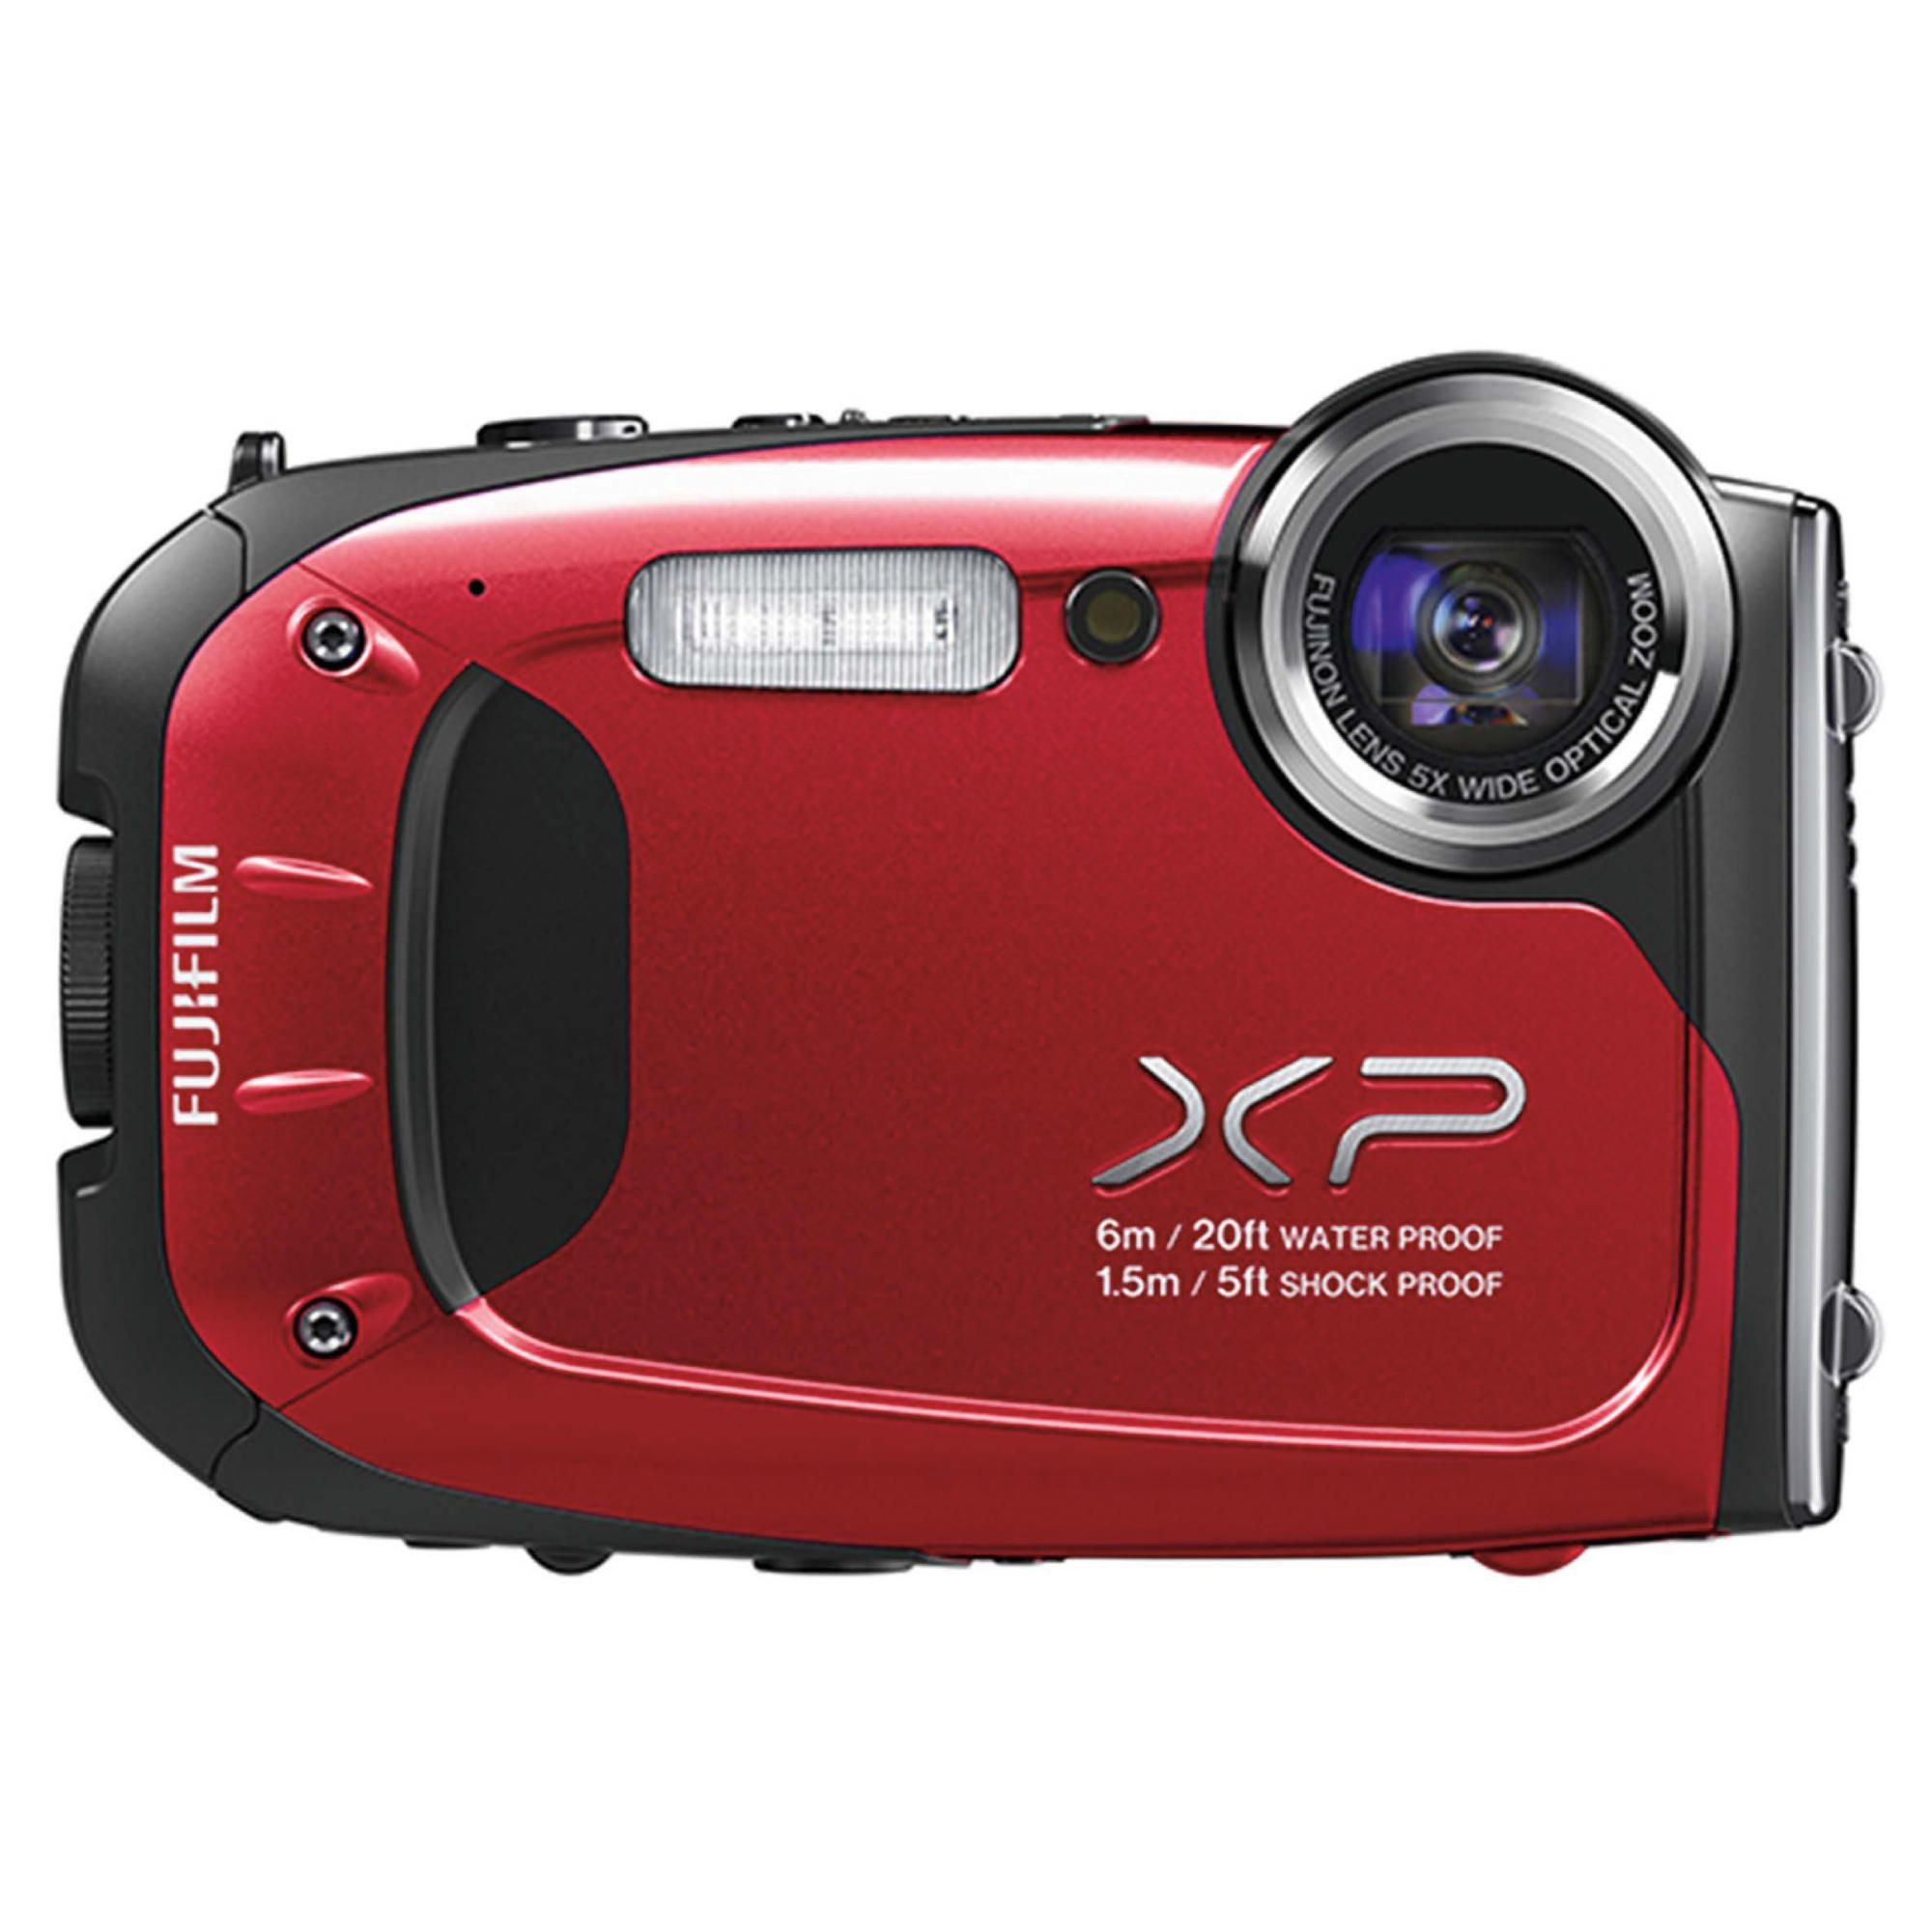 Fujifilm XP60 Tough Digital Camera, Red, 16MP, 5x Optical Zoom, 2.7 inch LCD Screen